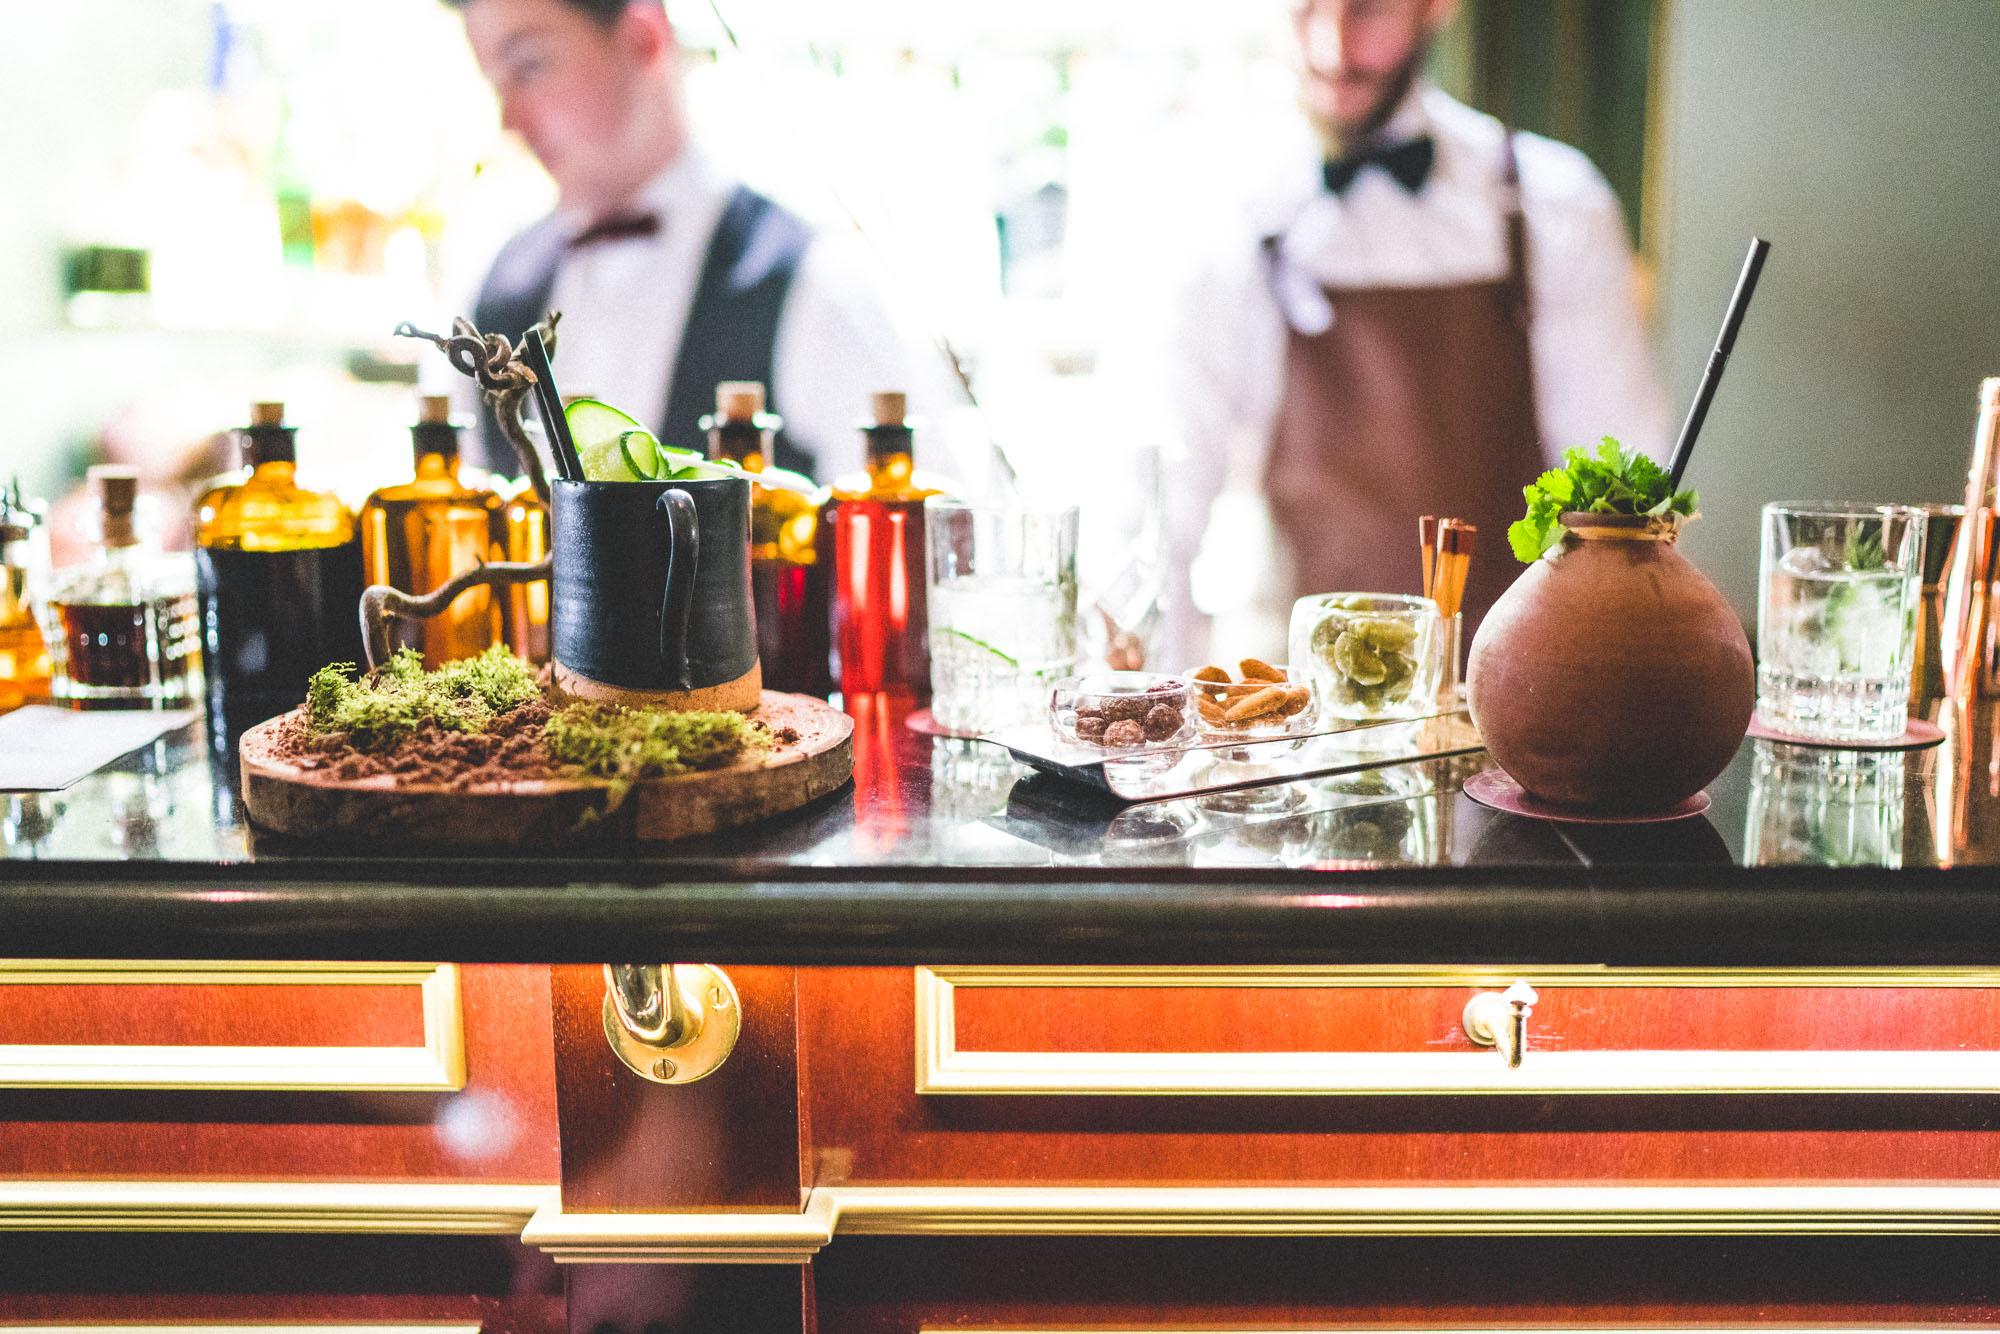 Trendy bars in Paris - Bar Botanist at the Shangri La Paris Hotel - Complete Paris Travel Guide